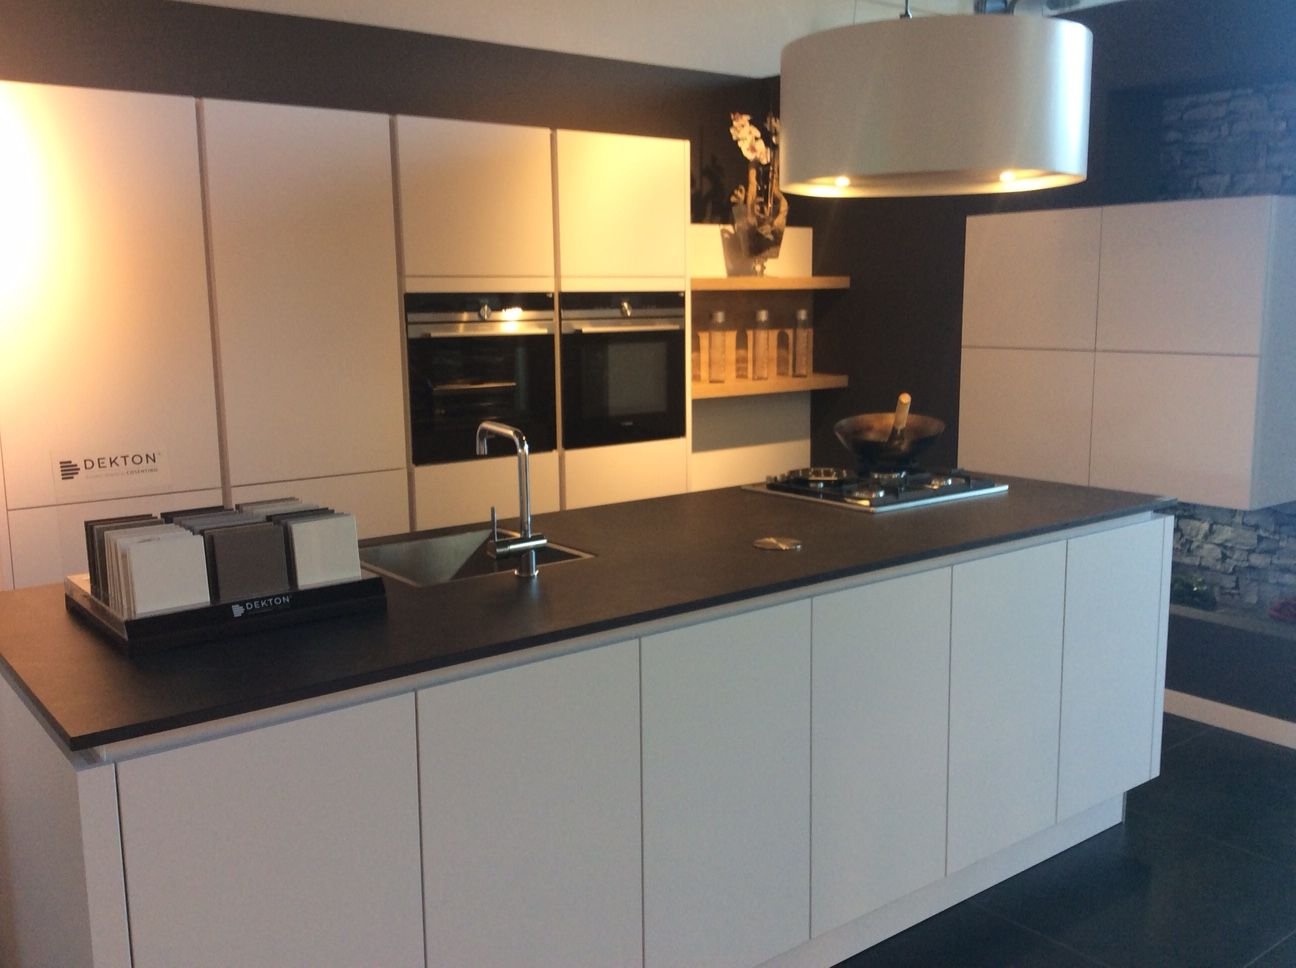 Keuken Modern Kleine : Modern en tijdloos witte greeploze keuken kookeiland met zwart